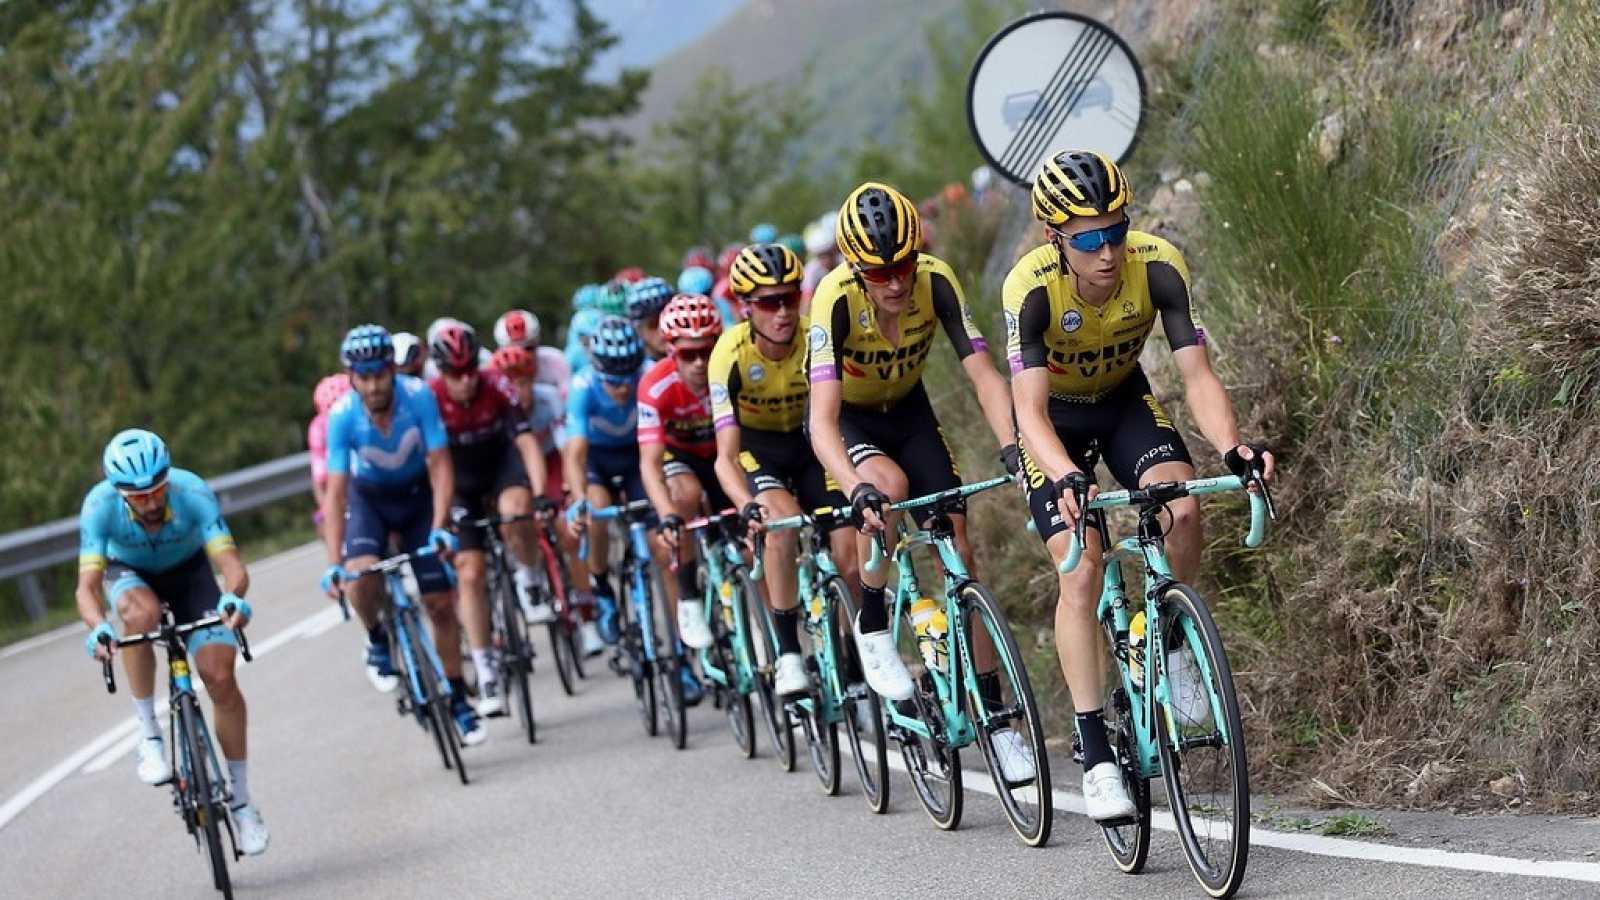 Vuelta Ciclista a España 2019 1 - 16ª etapa: Pravia - Alto de la Cubilla (Lena) (1ª parte) - ver ahora